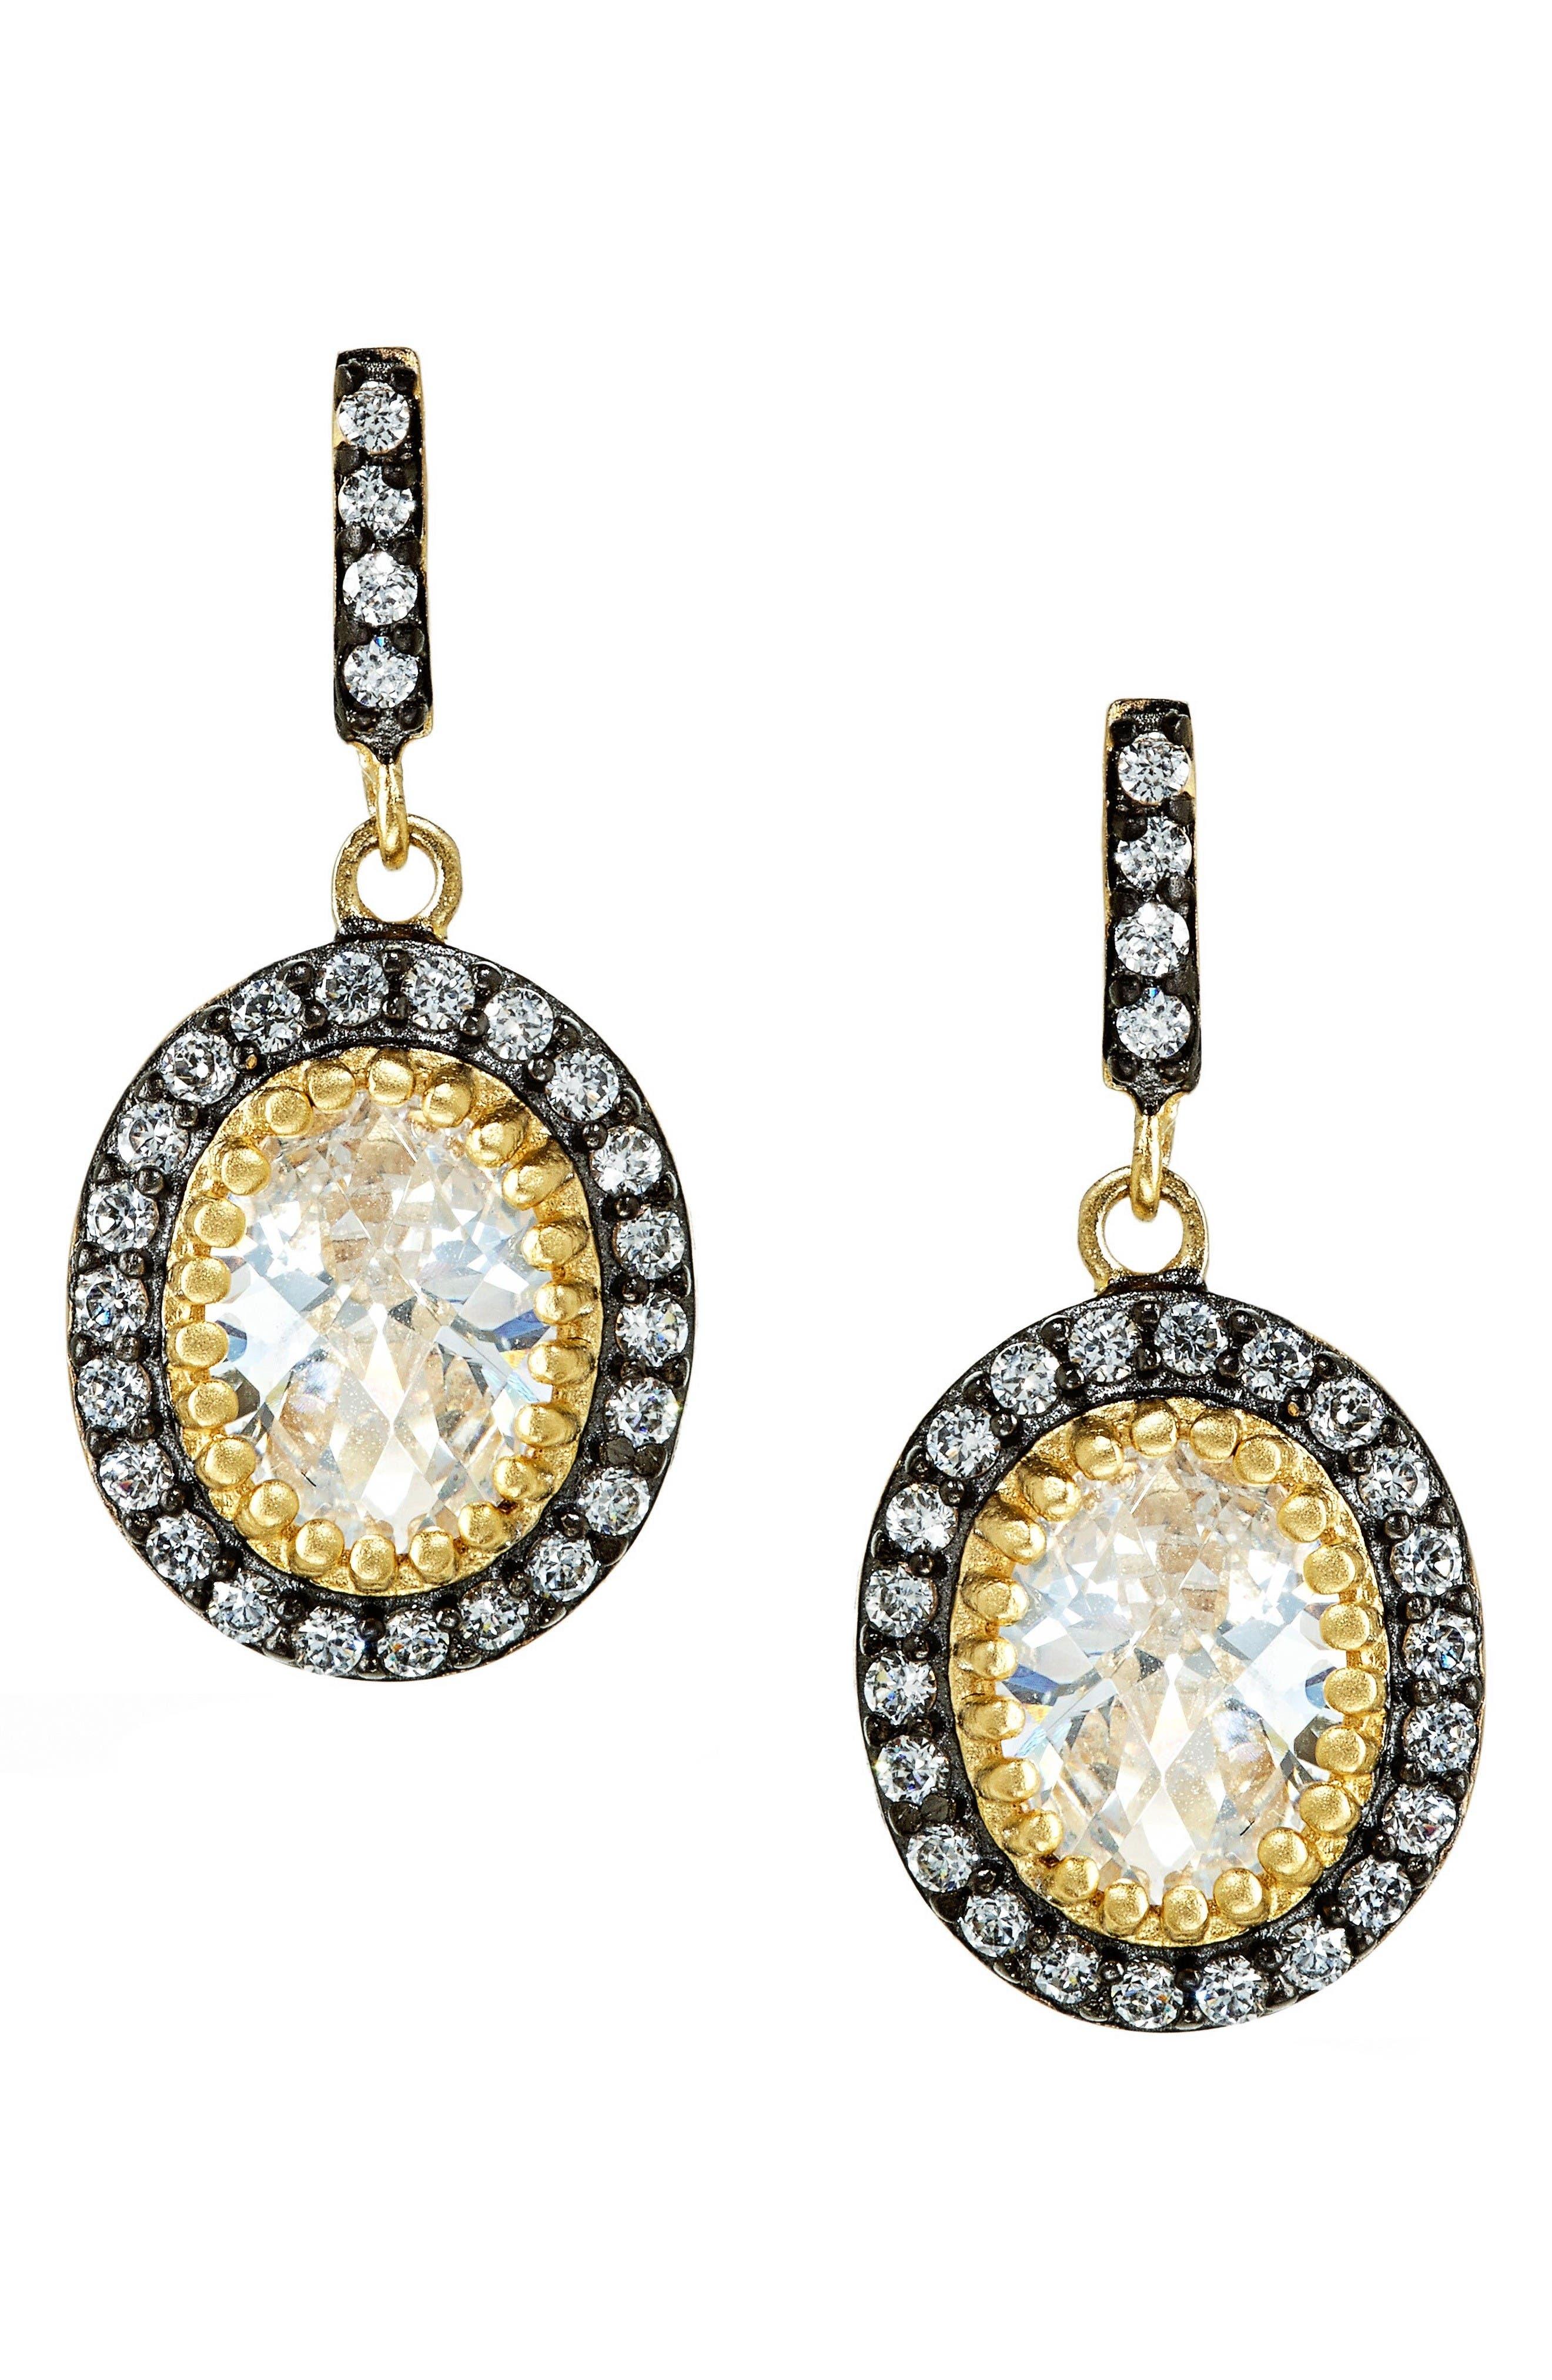 Alternate Image 1 Selected - FREIDA ROTHMAN 'Madison Avenue' Drop Earrings